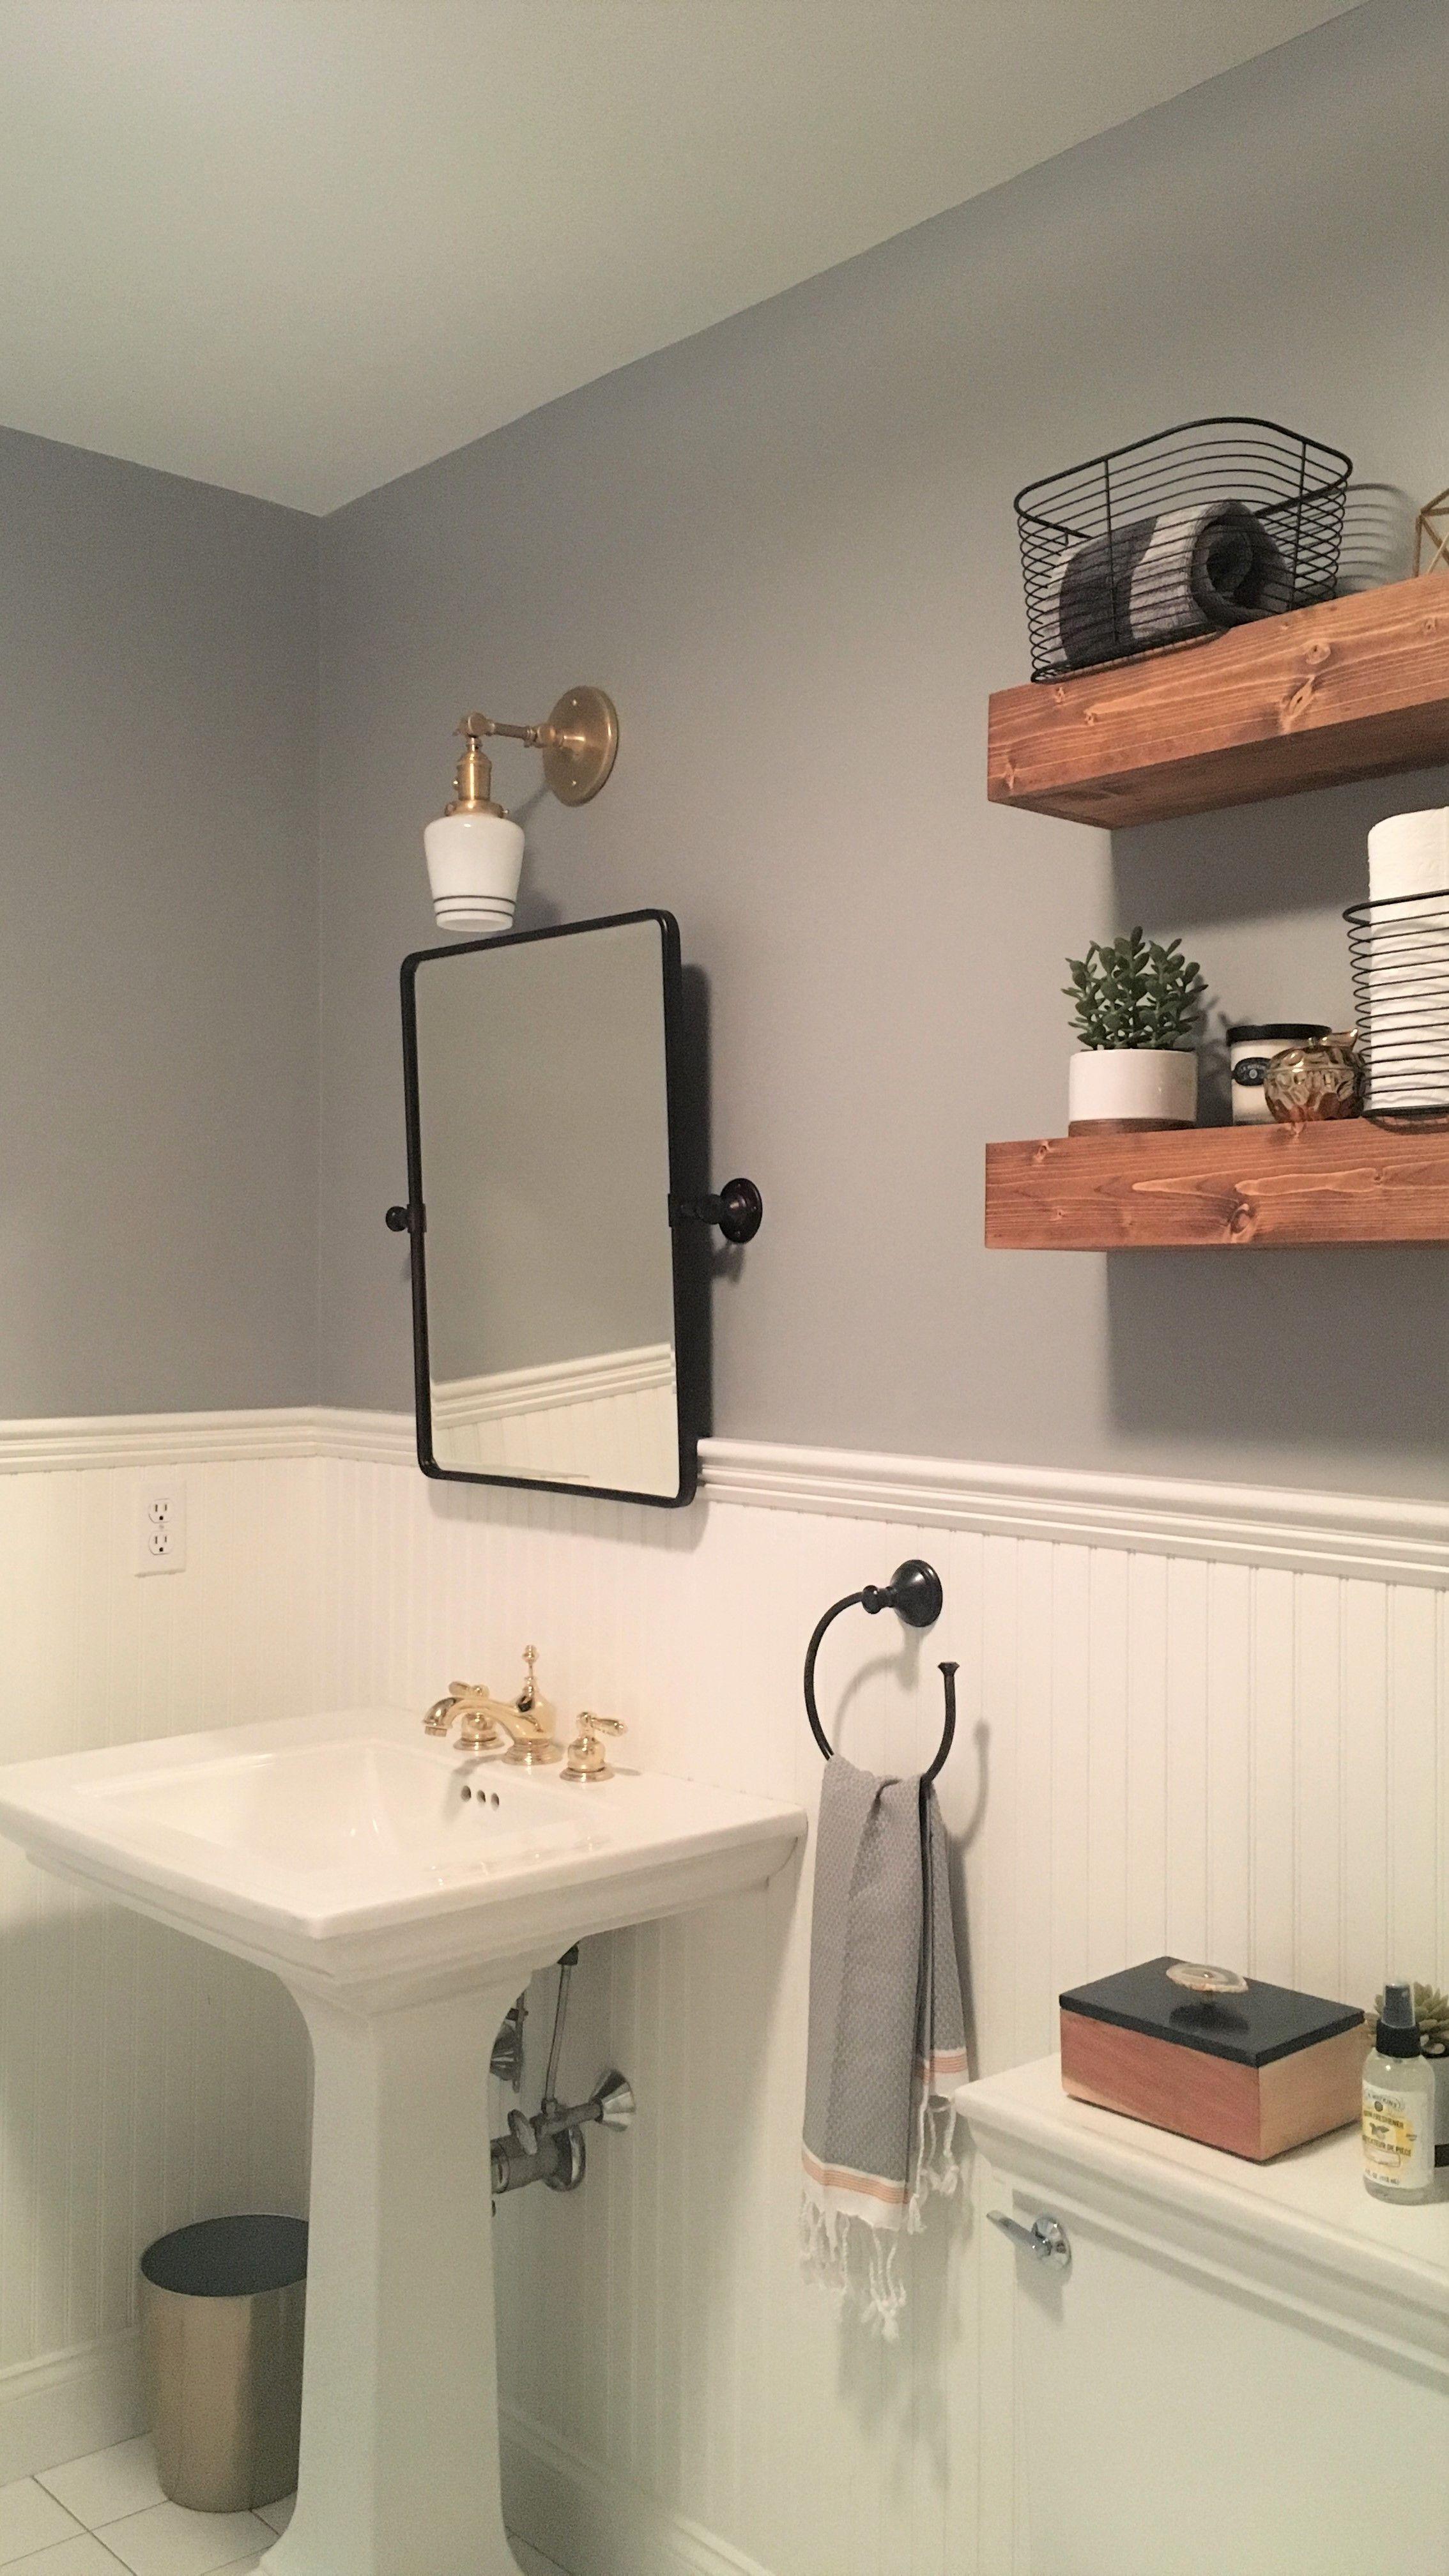 Modern Farmhouse Bathroom Floating Shelves Vintage Accents